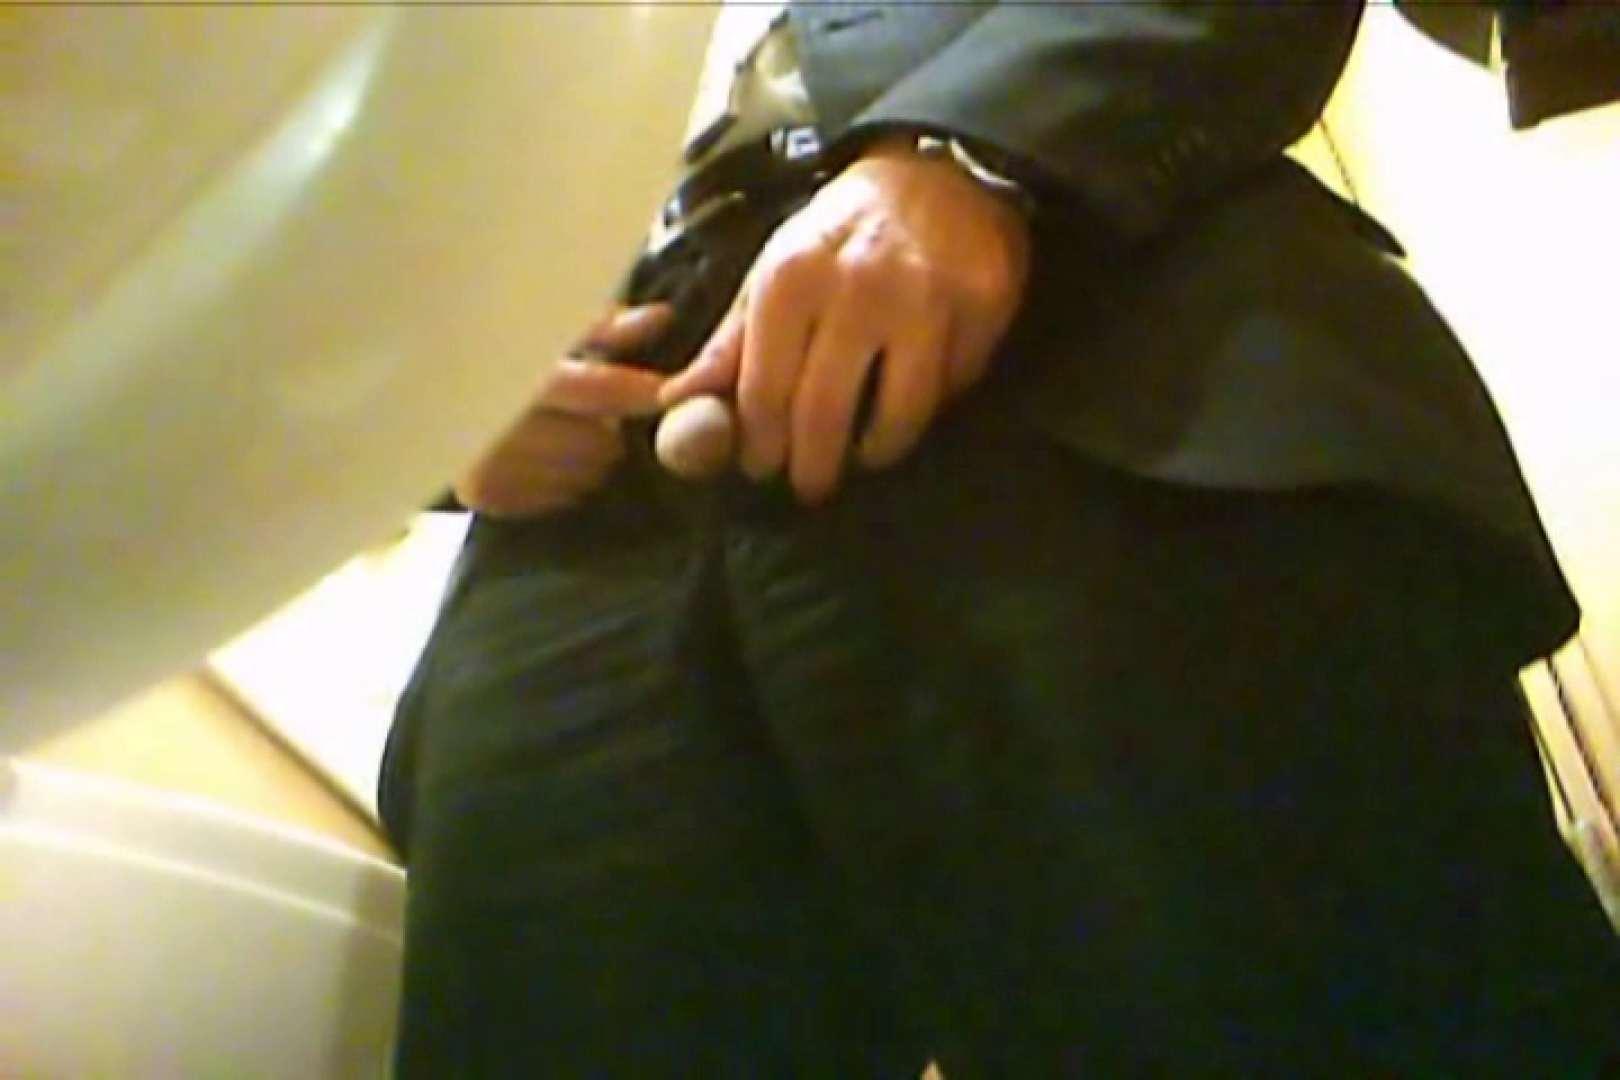 SEASON 2ND!掴み取りさんの洗面所覗き!in新幹線!VOL.22 おやじ熊系ボーイズ | ボーイズ私服  71pic 31